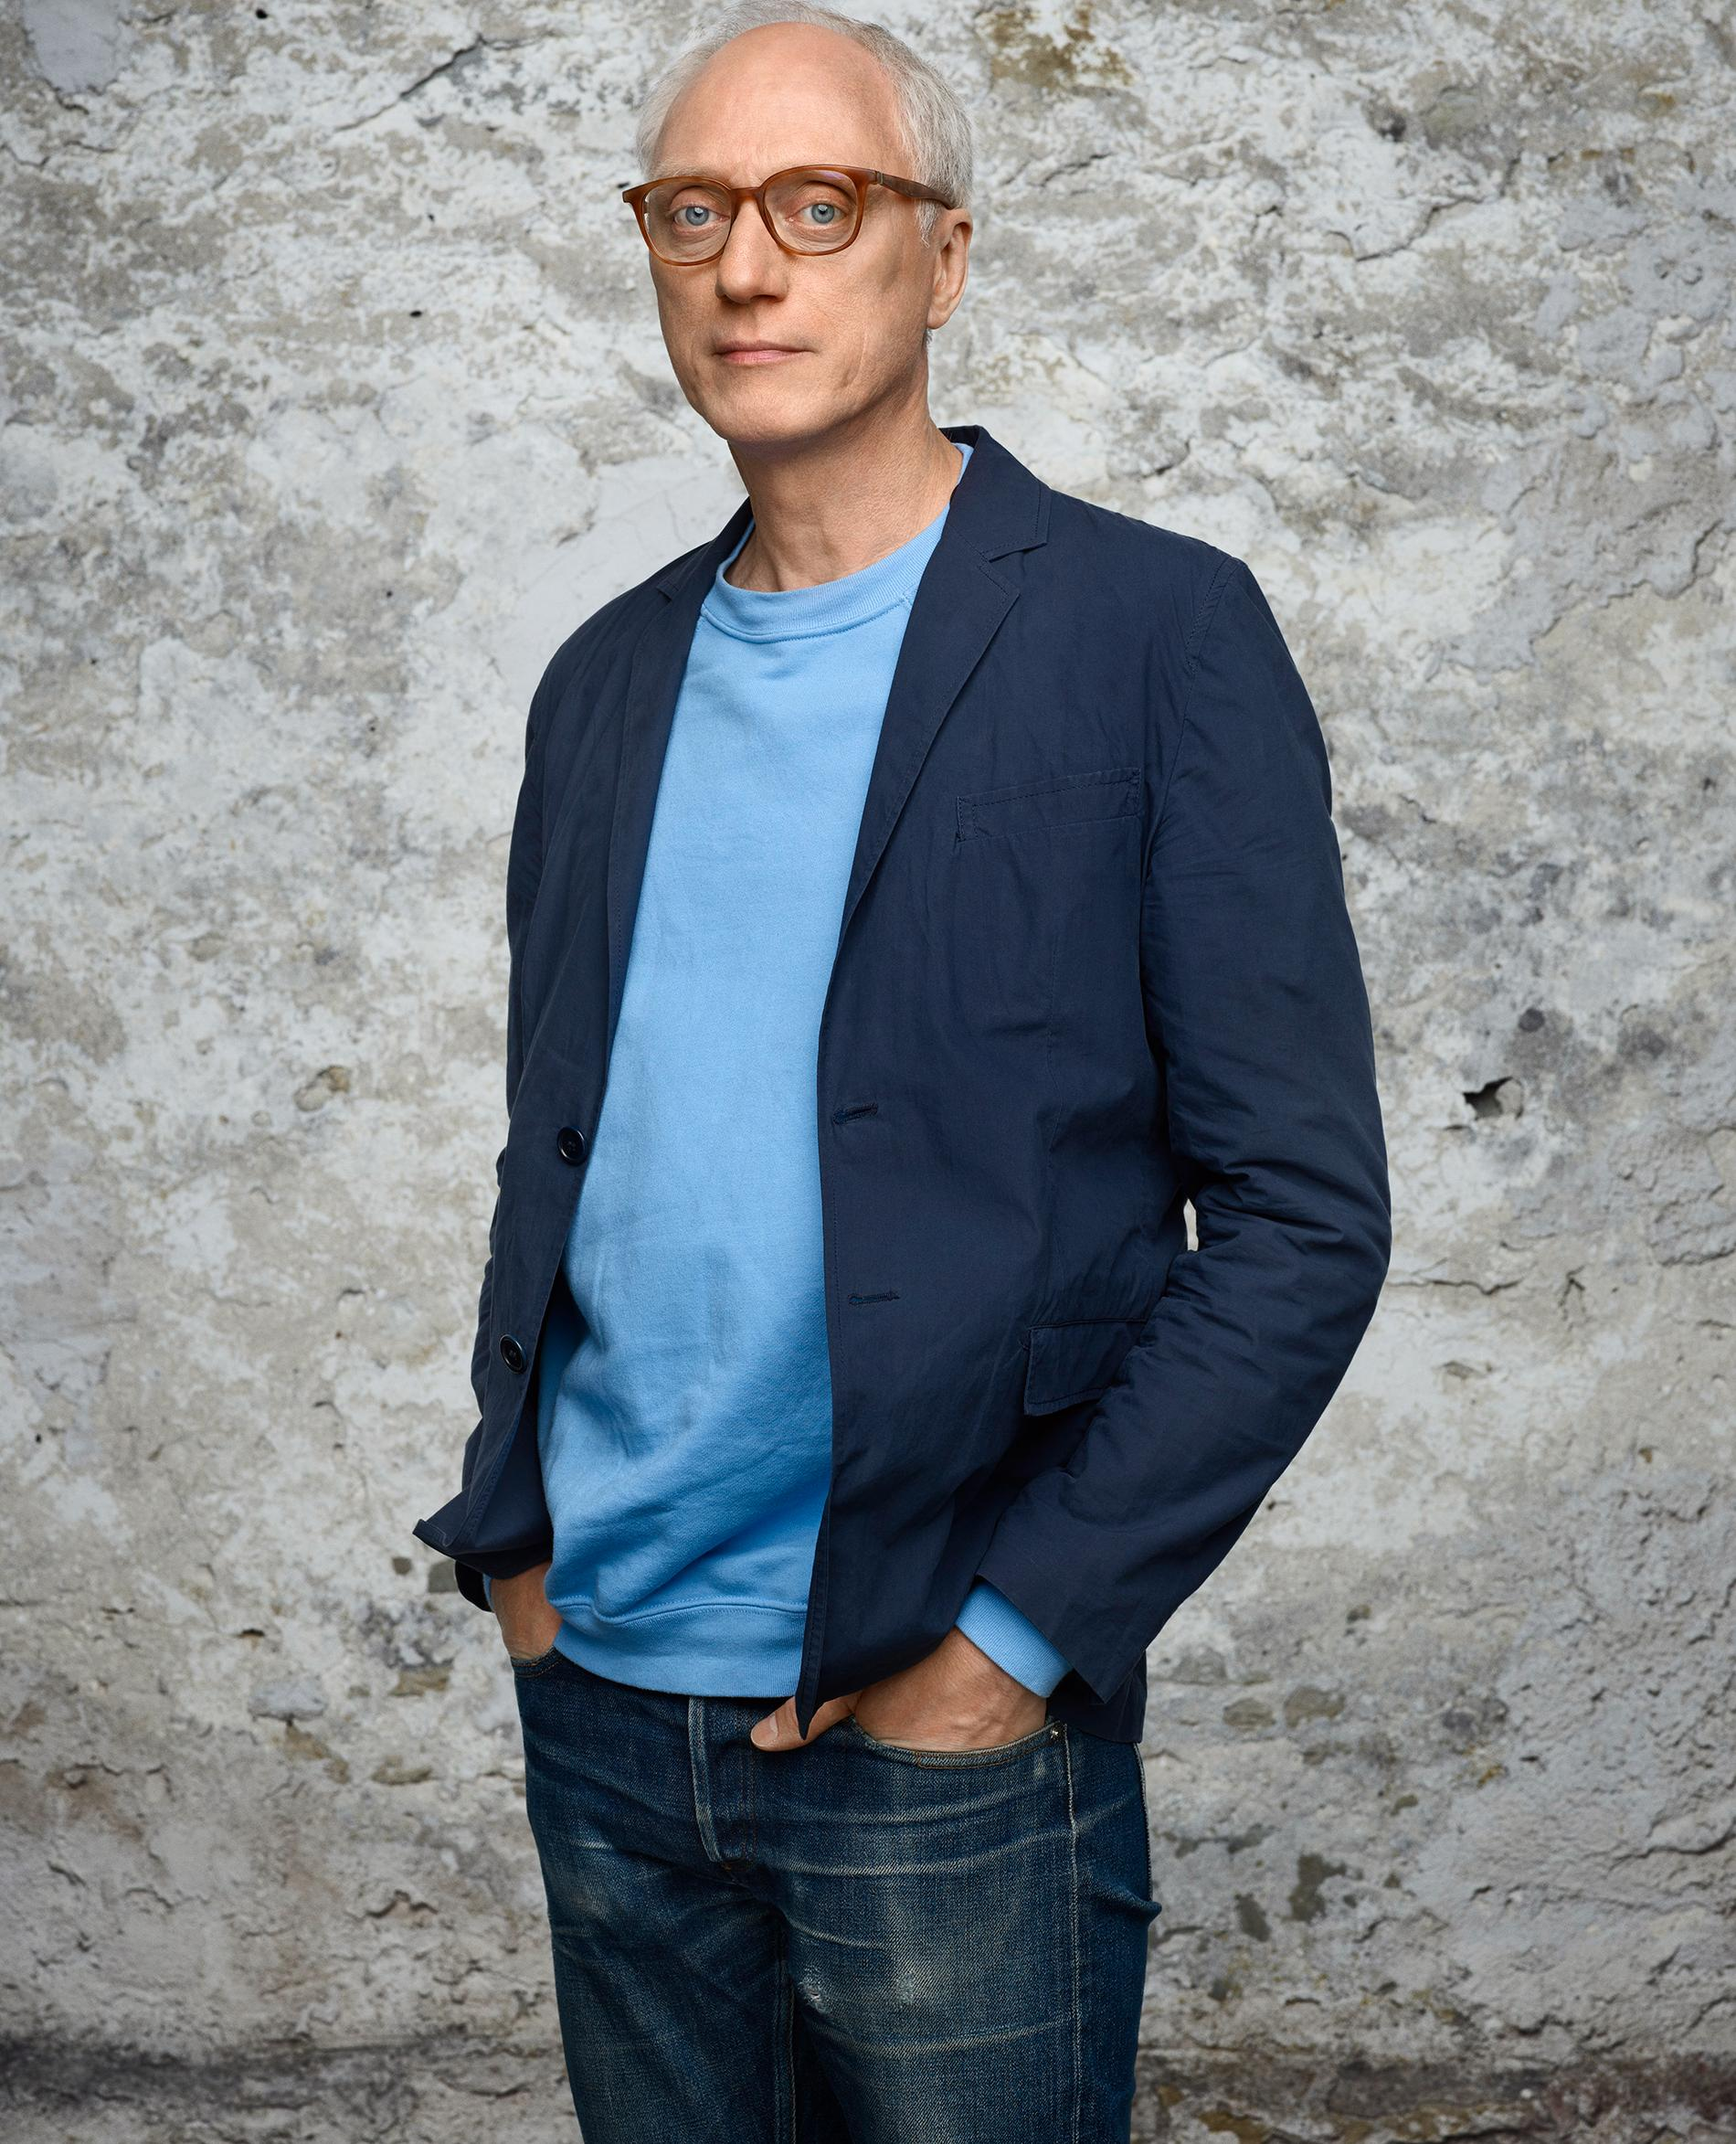 Andreas Mattsson.